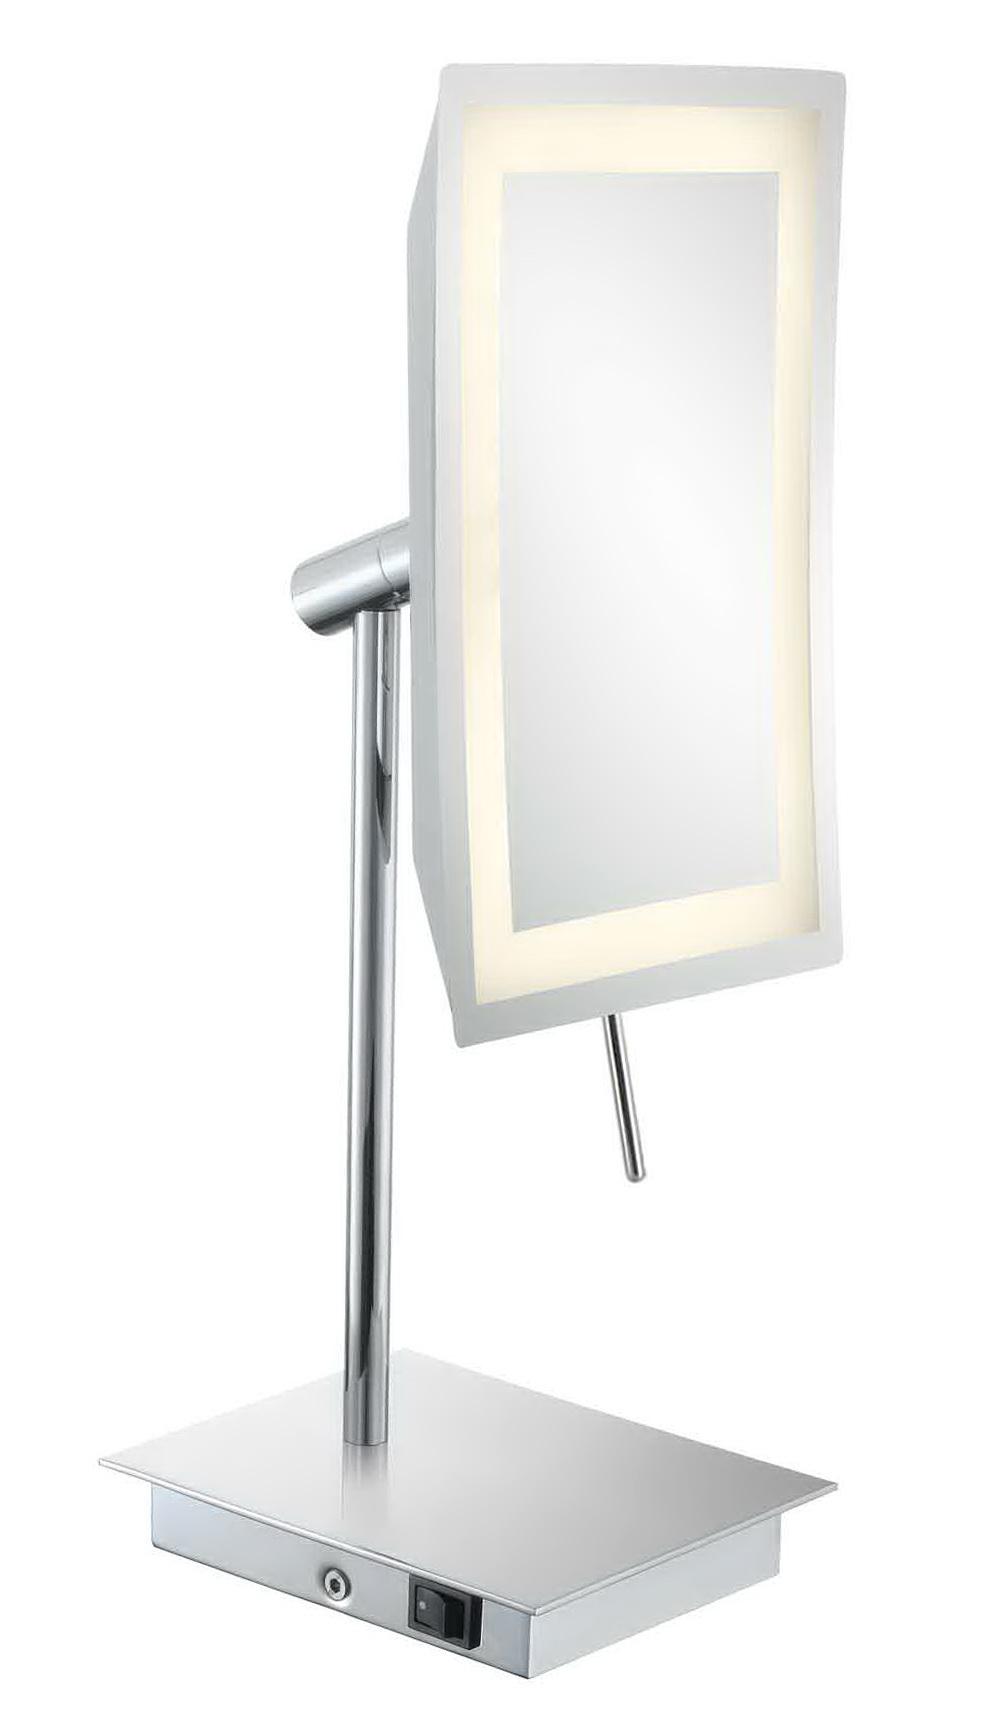 Lighted Makeup Mirror 15x